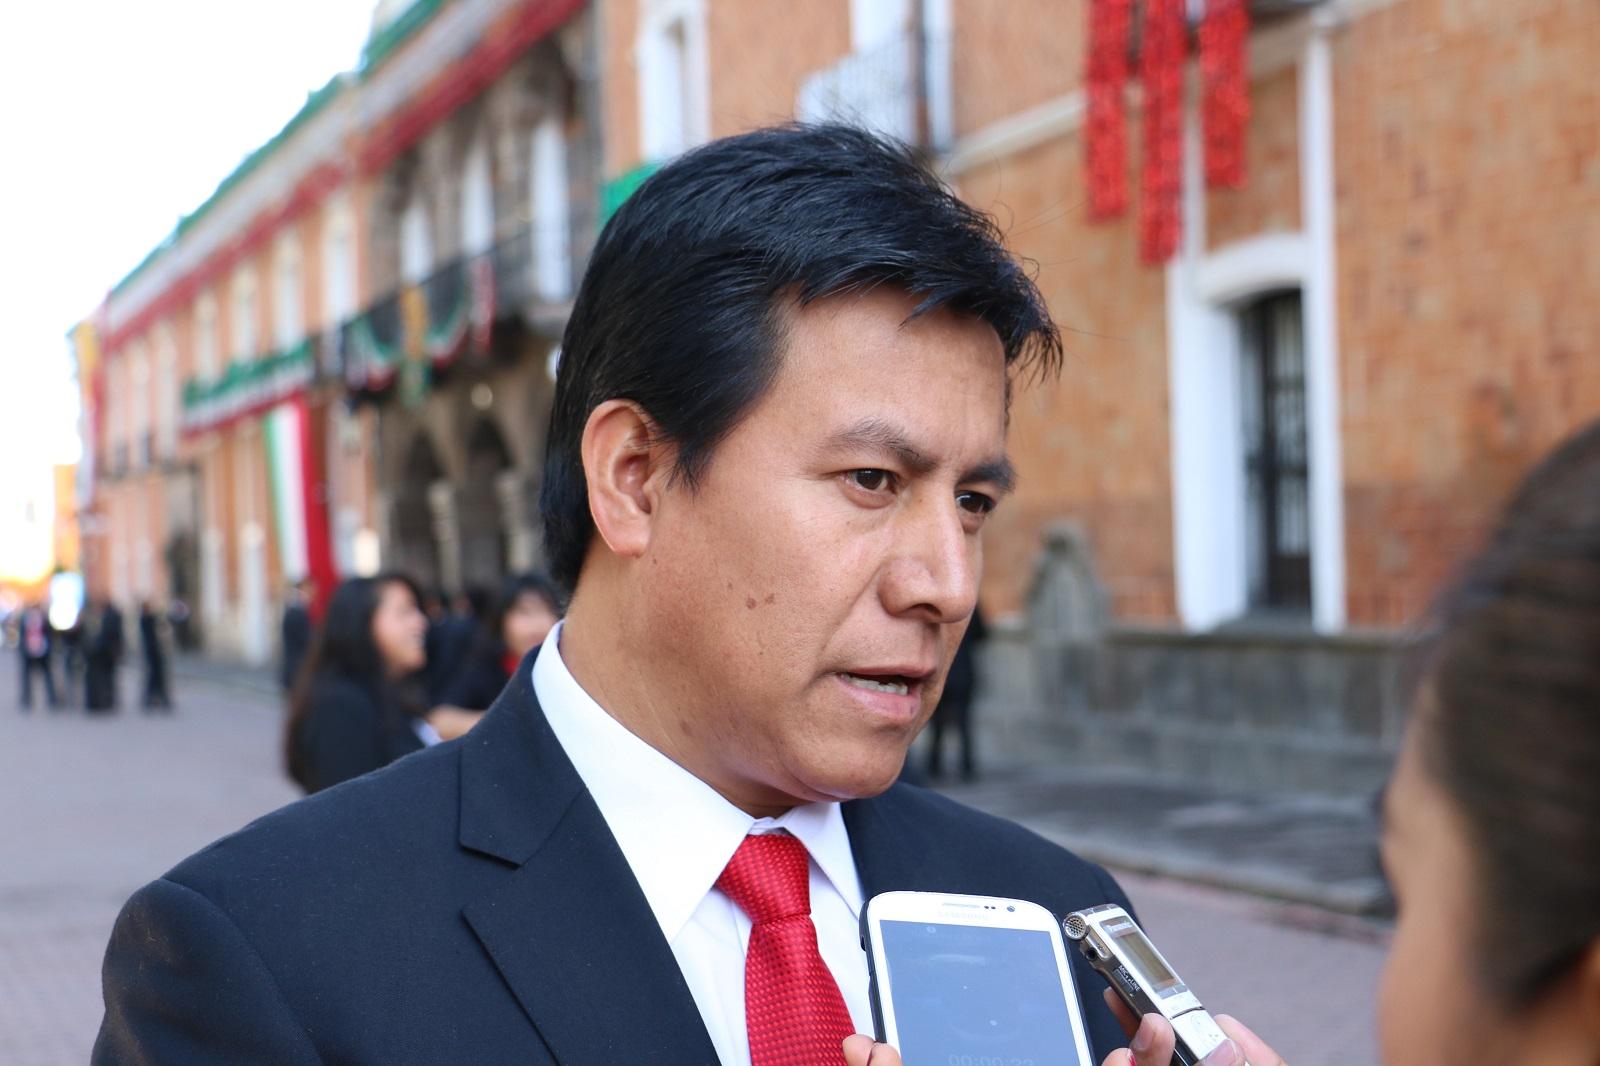 Por deudor busca MGZ al alcalde de Chiautempan